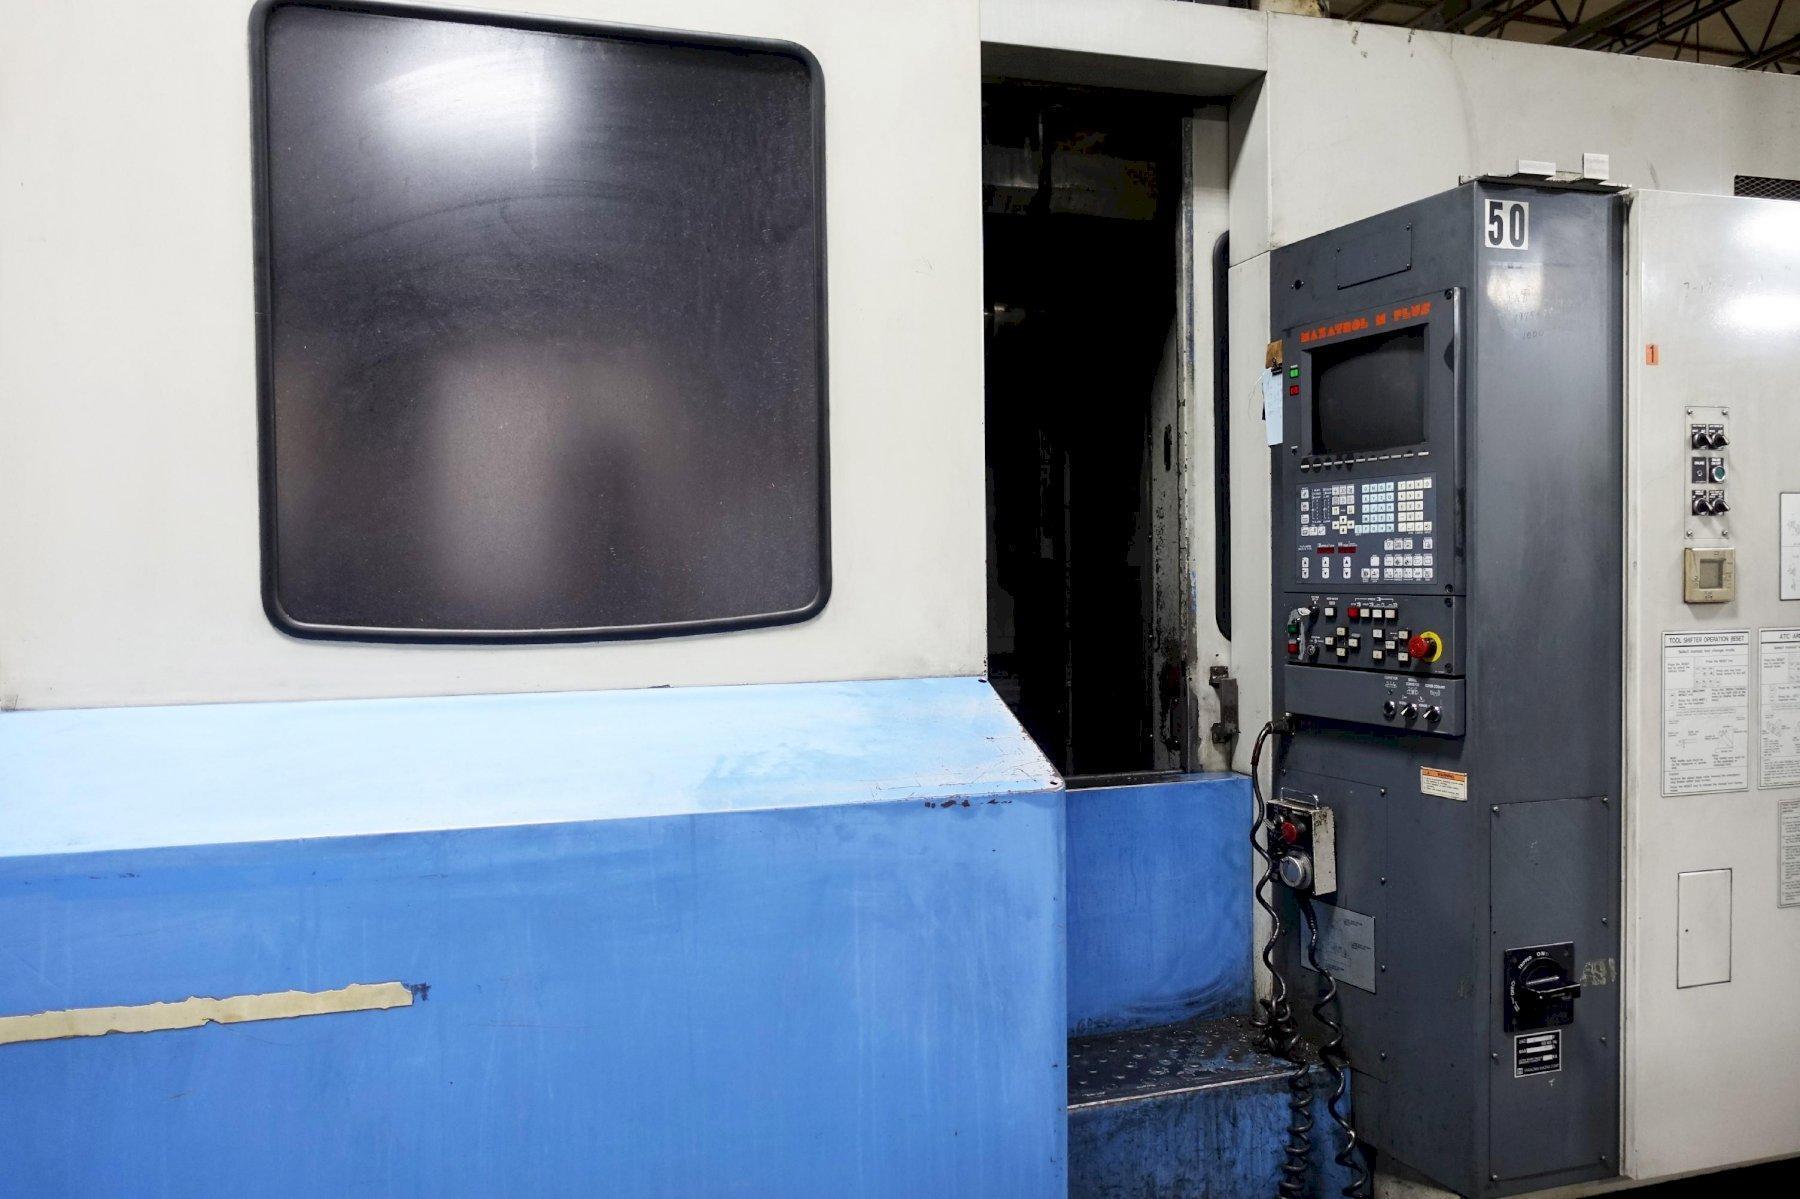 MAZAKMazak FH680 CNC Horizontal Machining Centers - (3) Available!